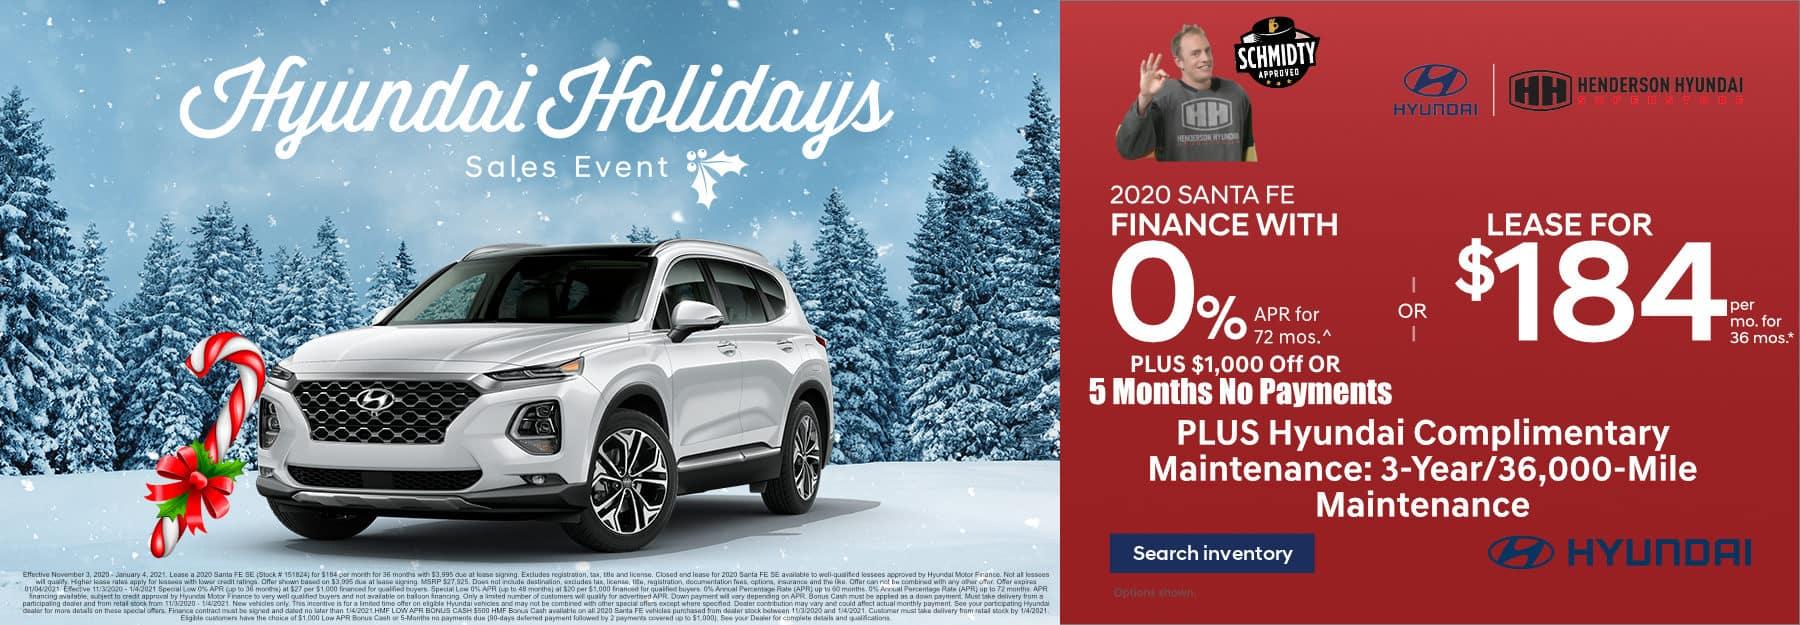 Revised_December-2020_2021_Santa_Fe_Henderson_Hyundai